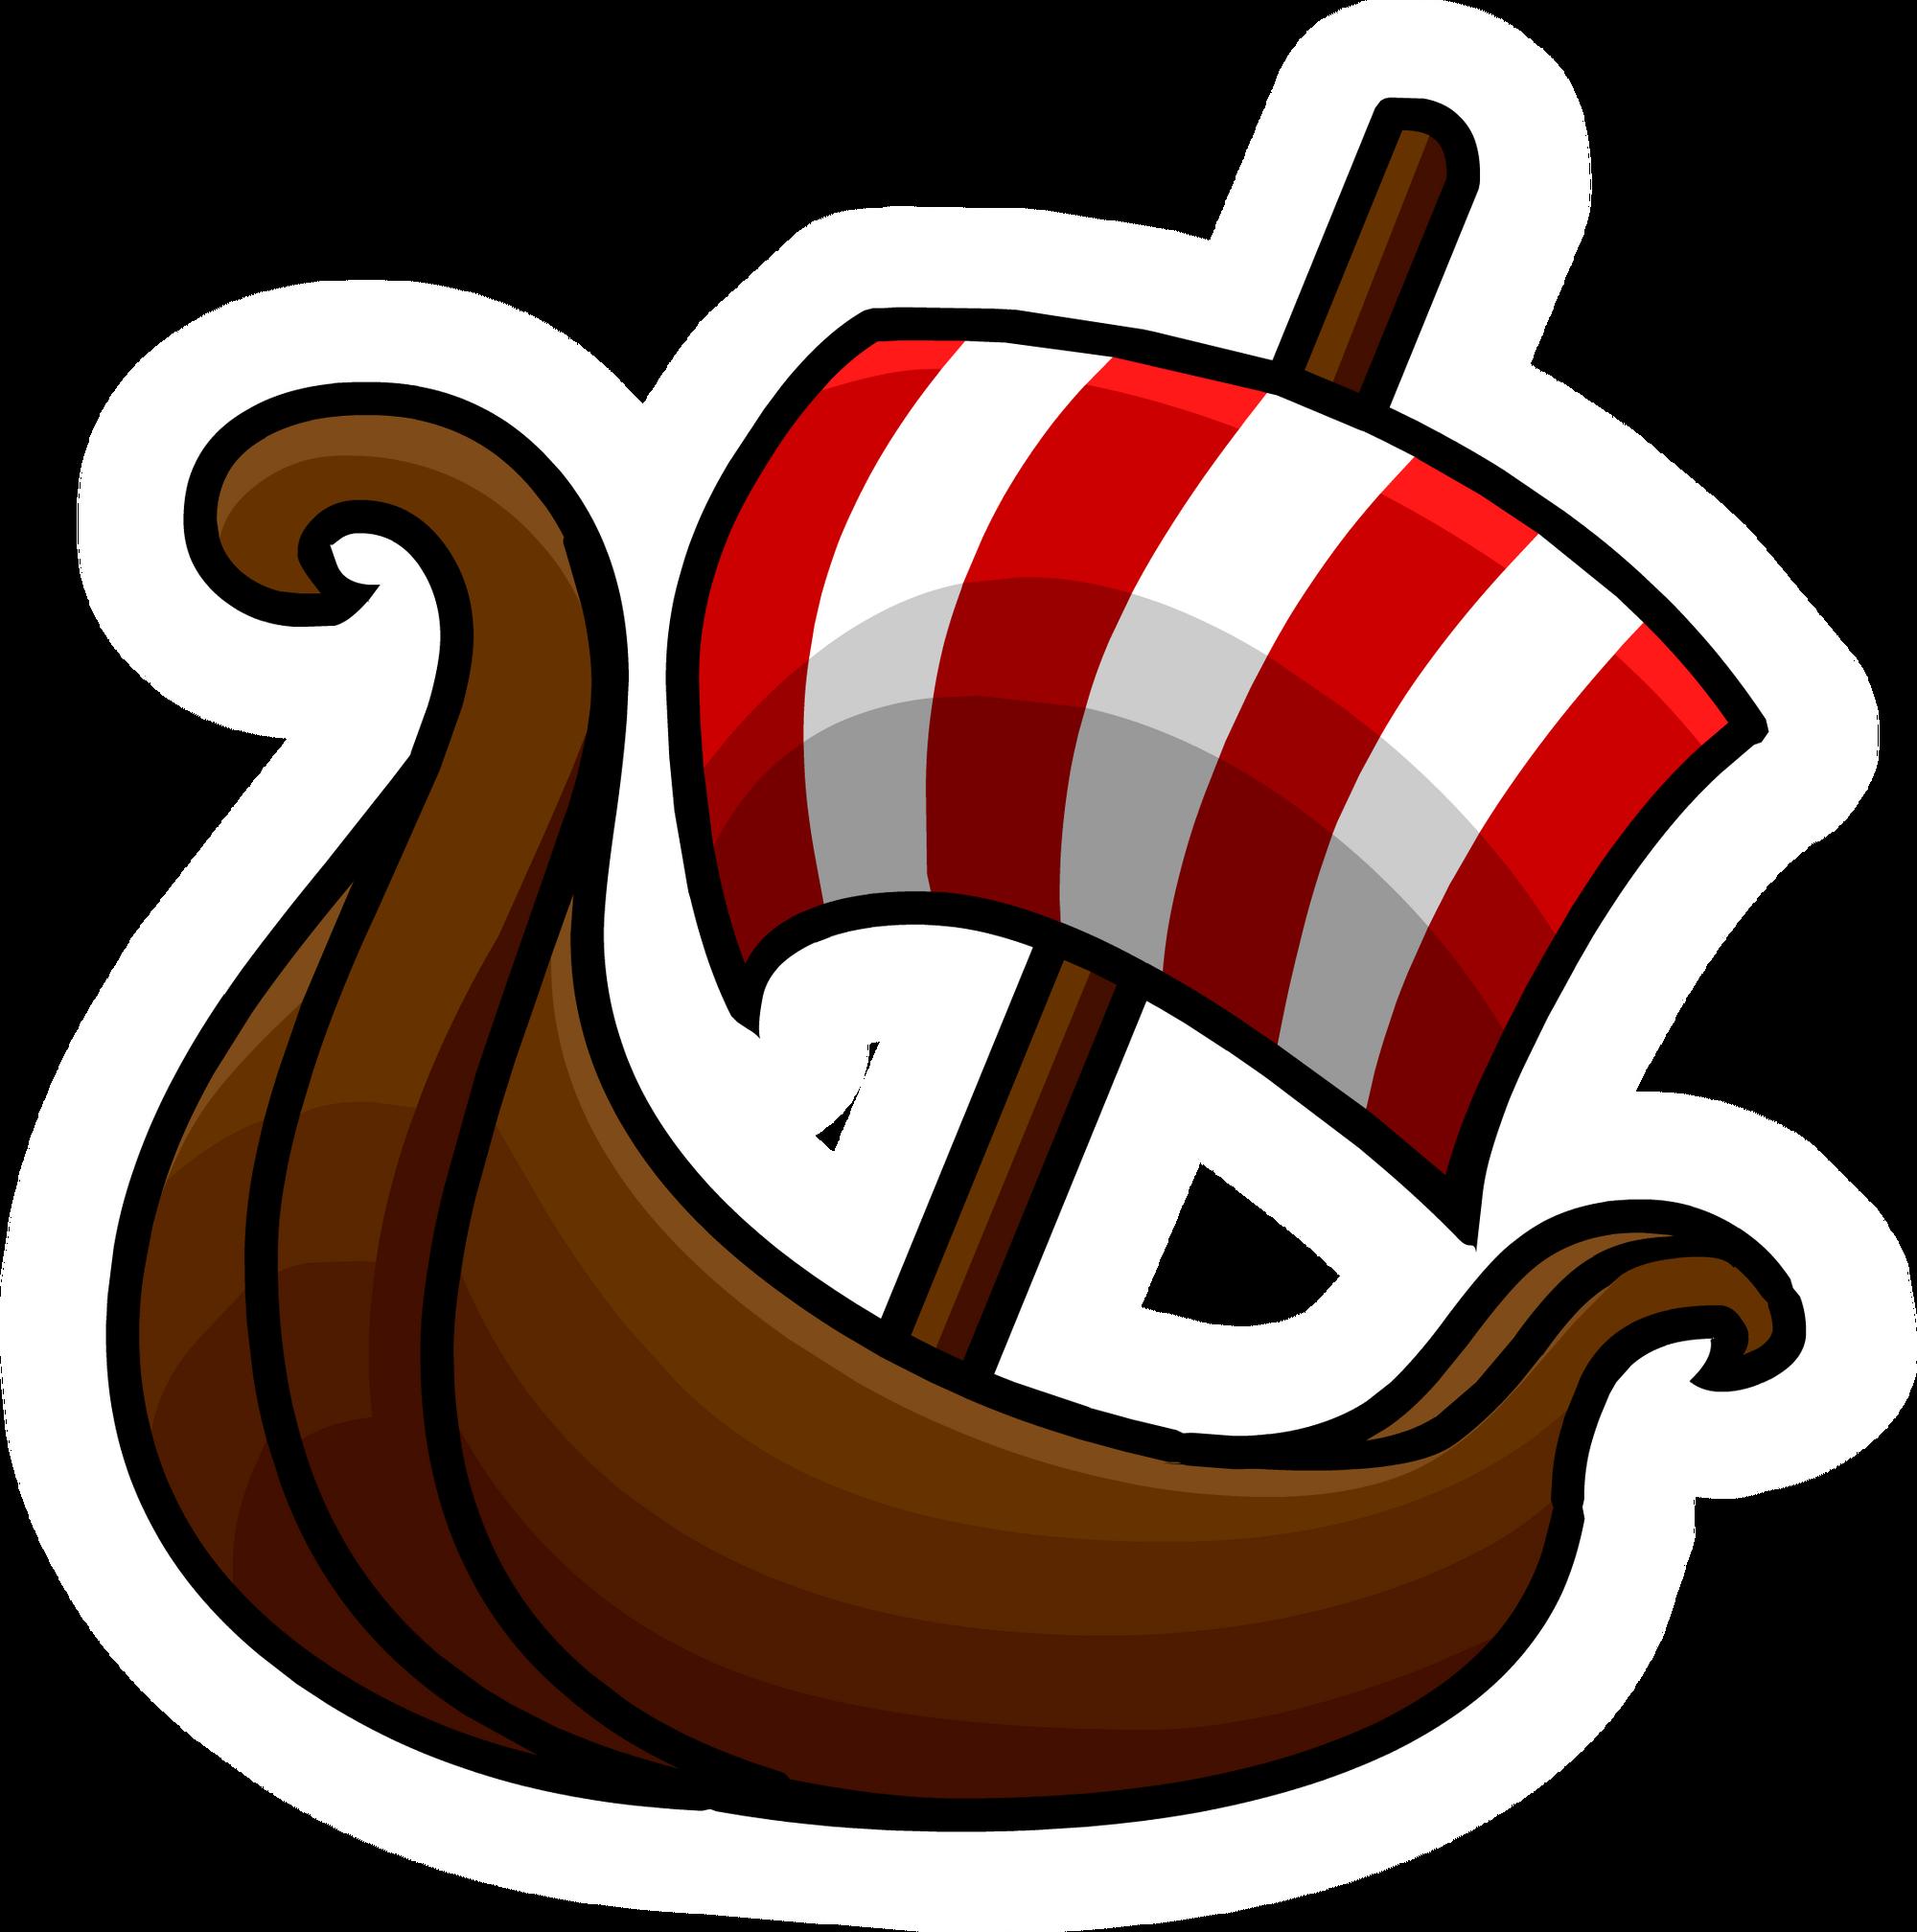 image viking ship pin 1 png club penguin wiki fandom powered